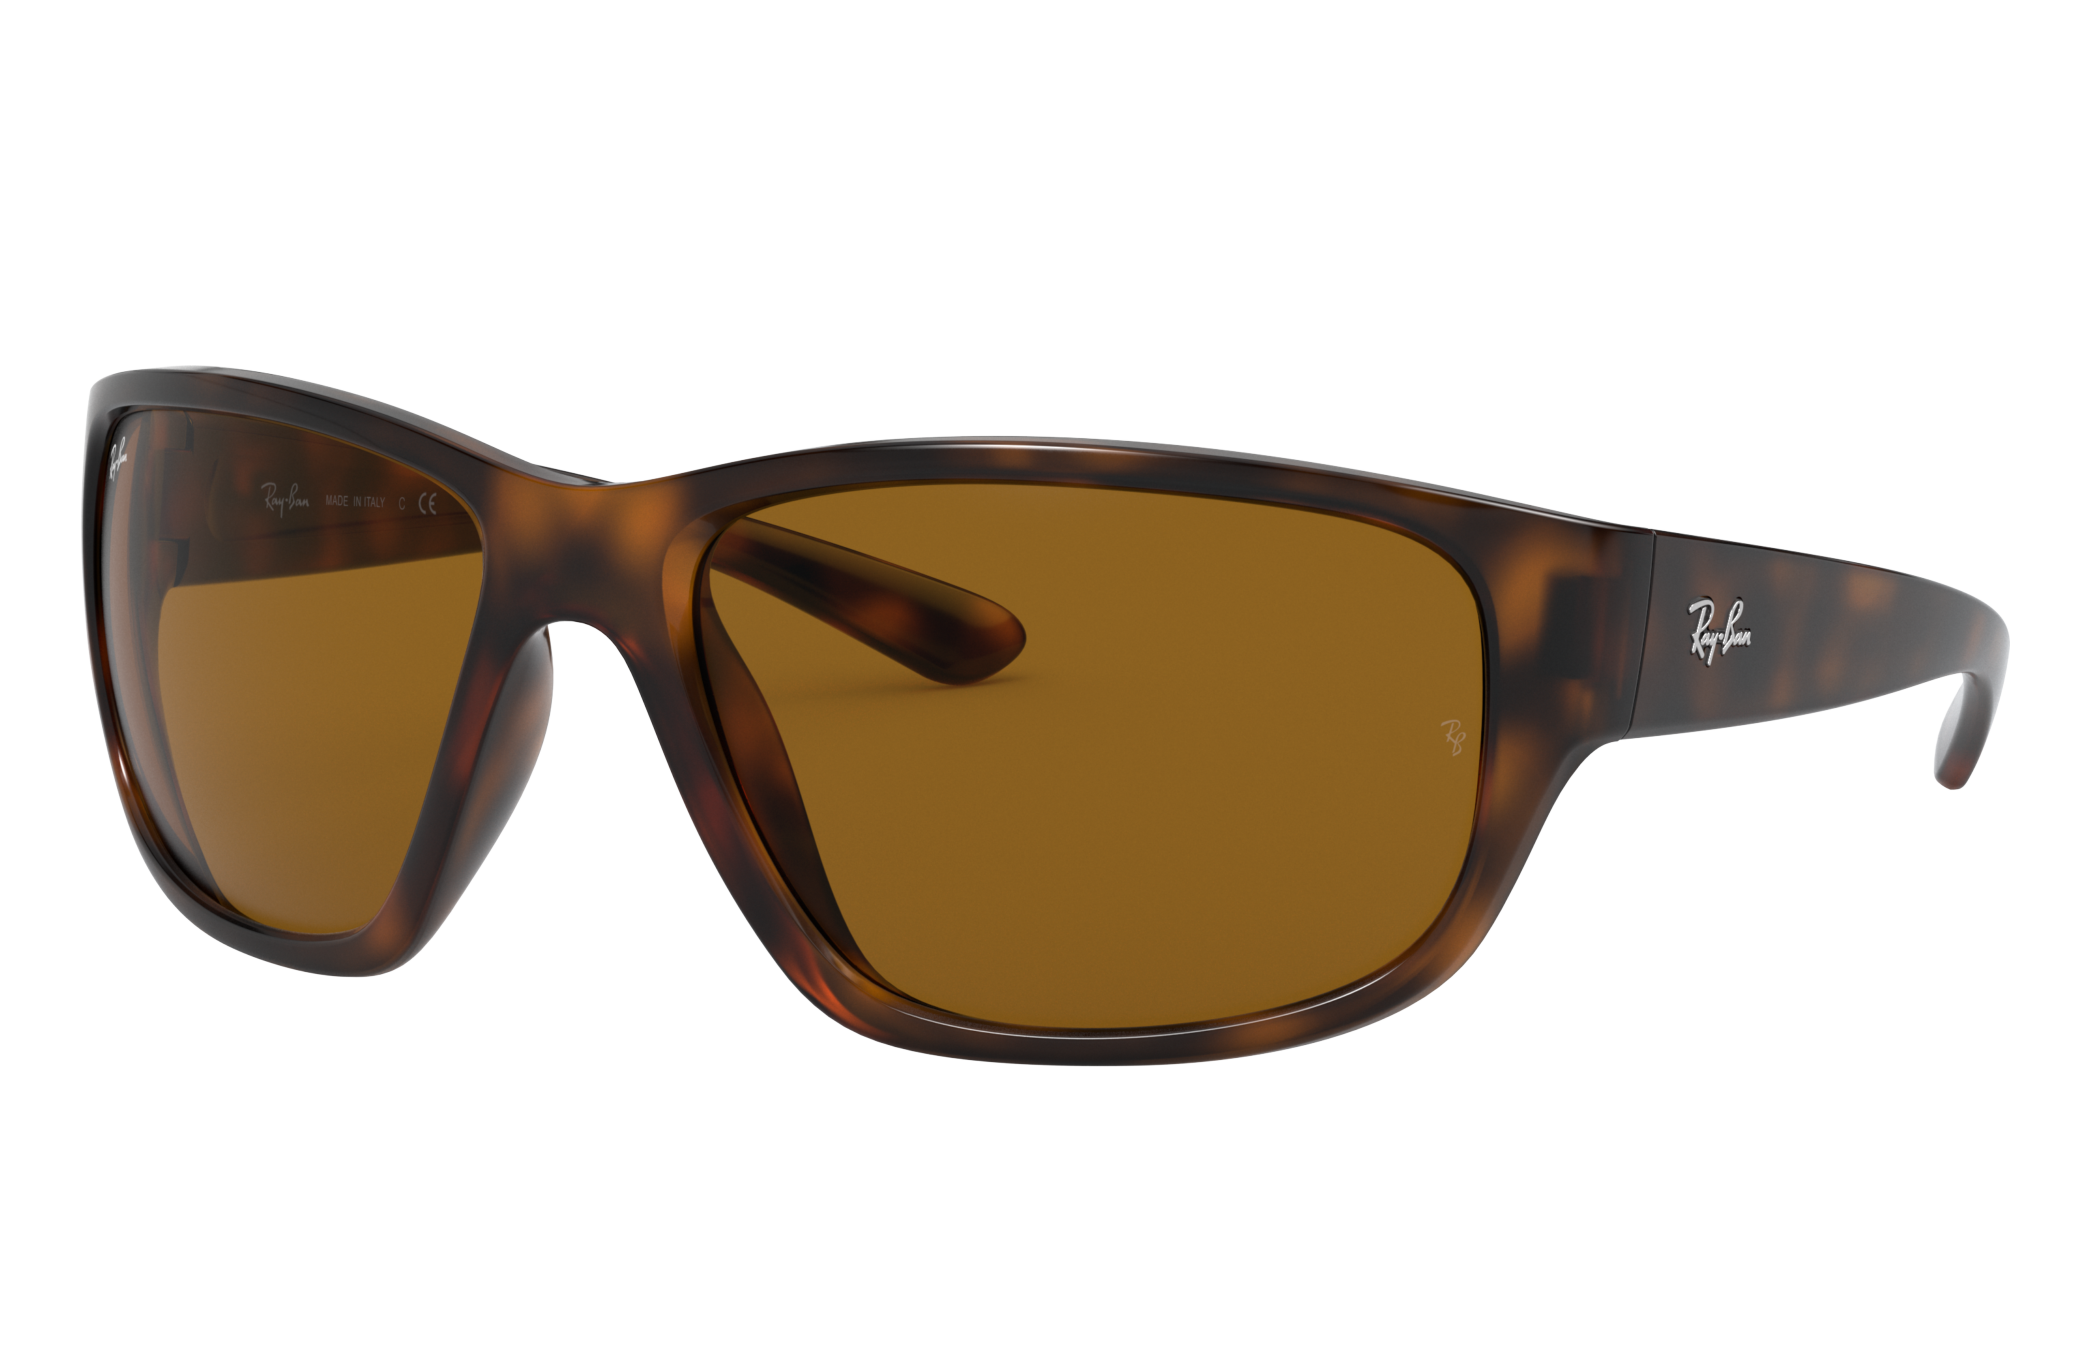 Ray-Ban Rb4300 Tortoise, Brown Lenses - RB4300